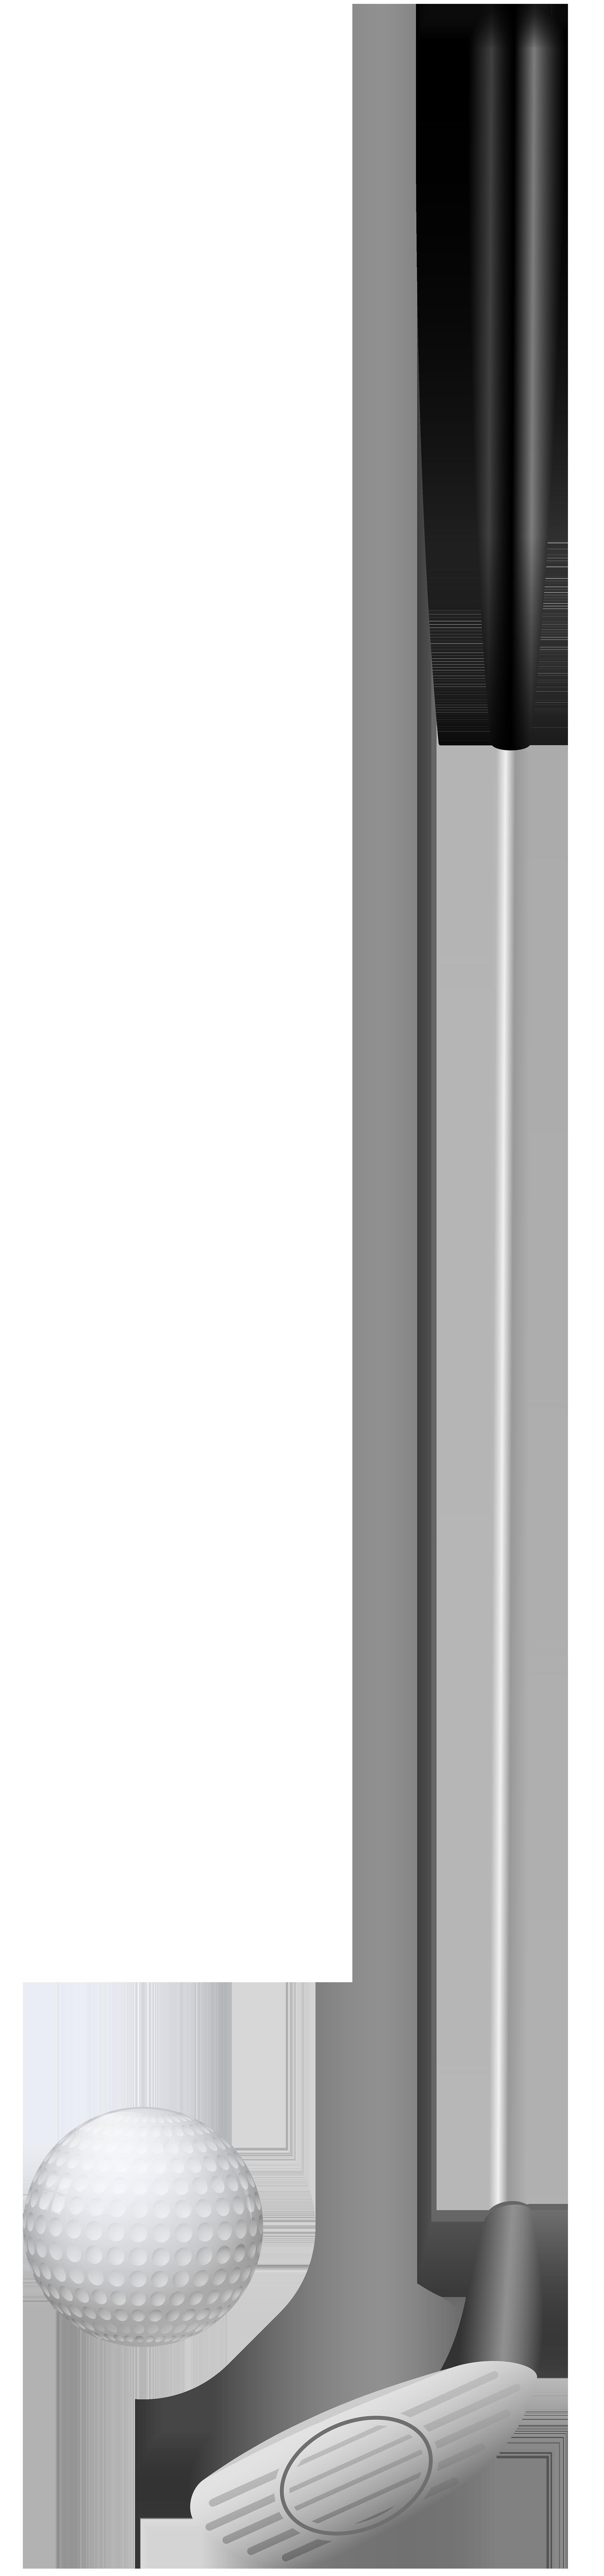 Club clipart golf stick. Png clipa art image